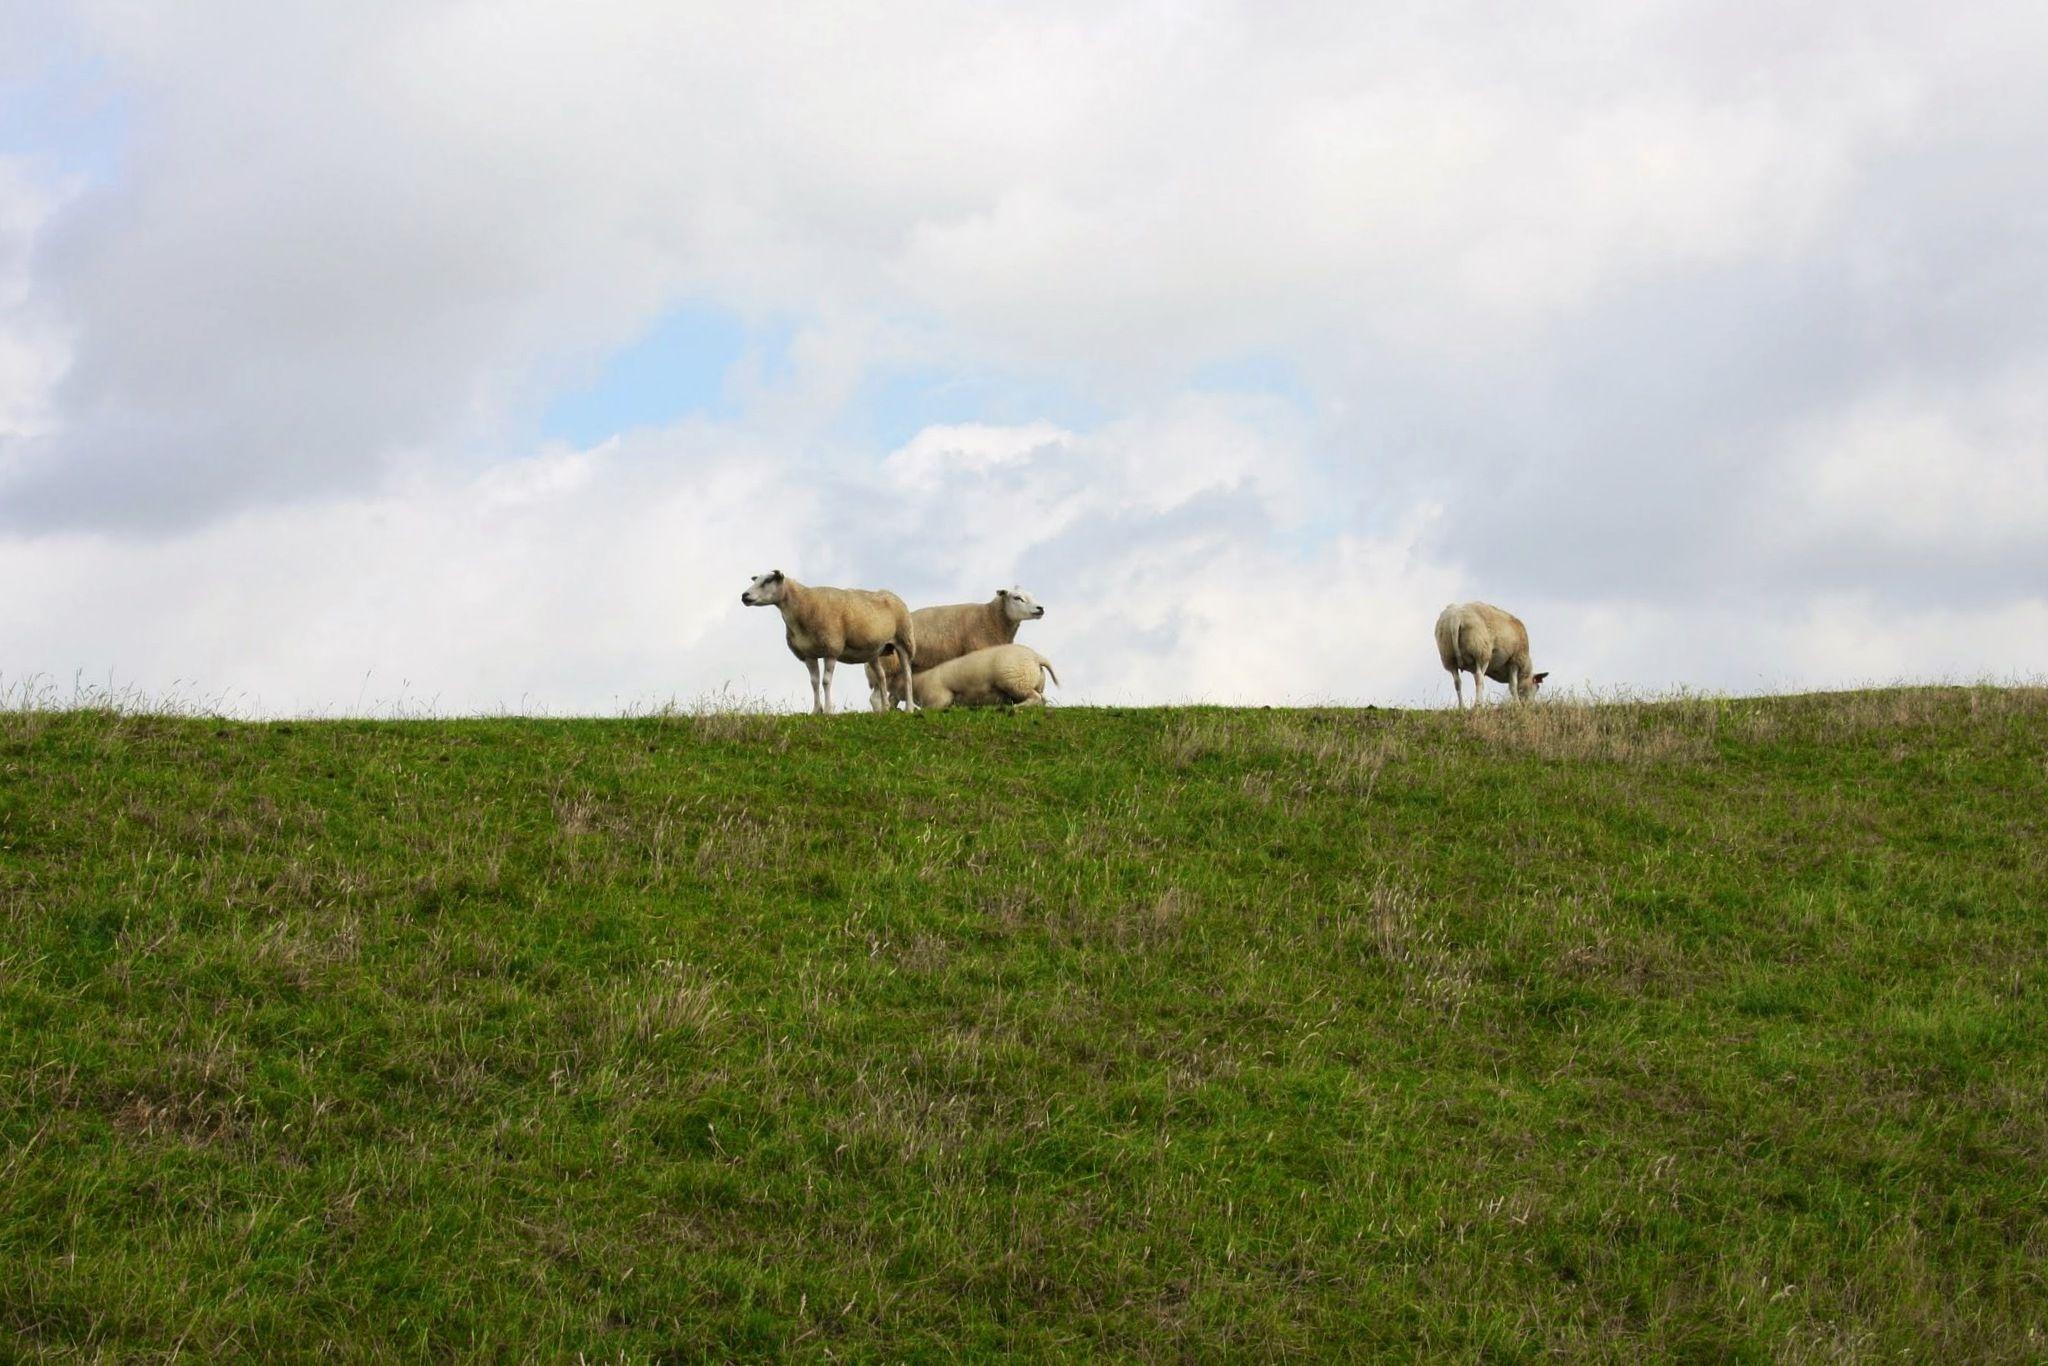 Summer 2013 Stavoren a tribute to Counting Sheep  Hans van der Meer- schapen tellen http://youtu.be/VYTGWLY2Db0